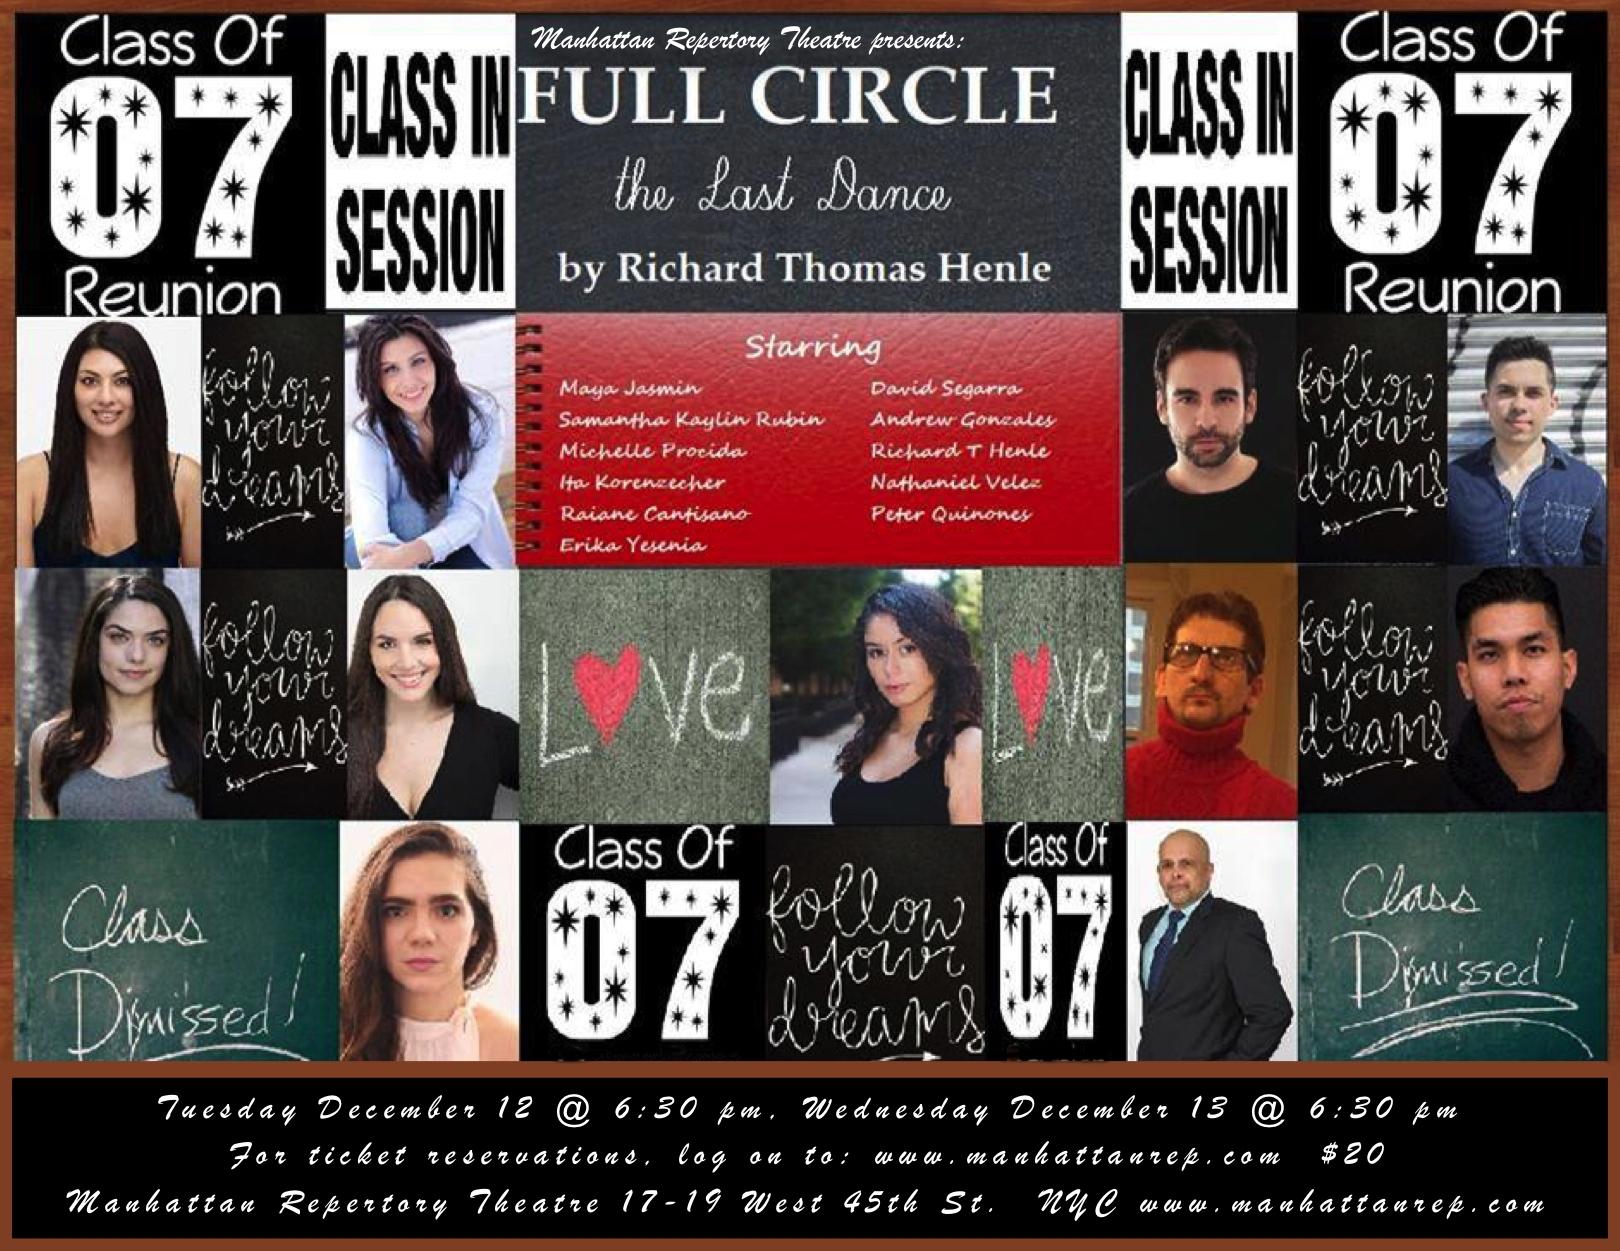 FULL CIRCLE Richard Thomas Henle 2017.jpeg